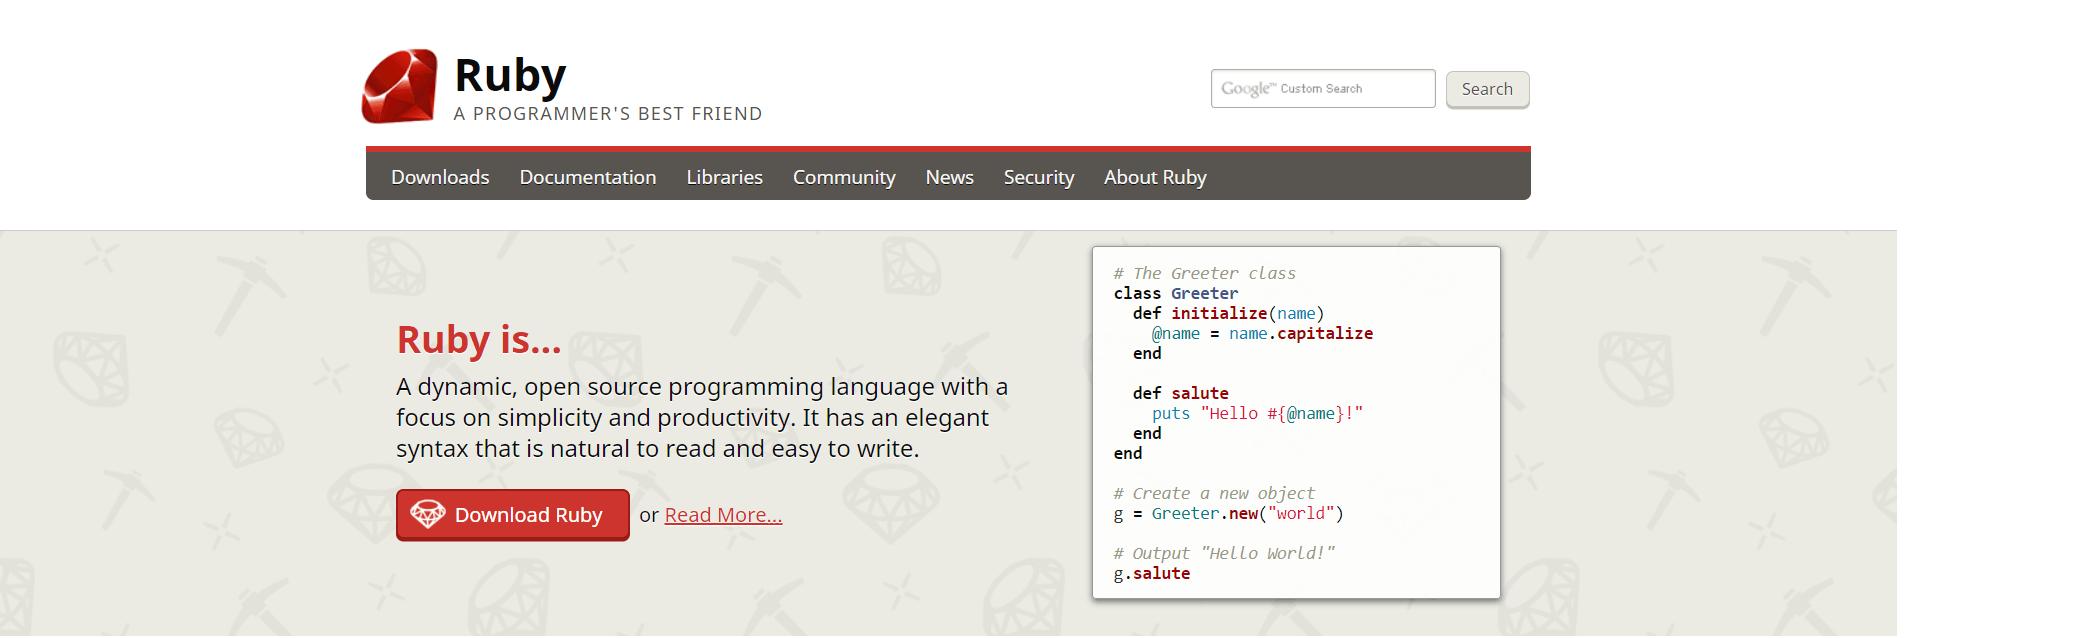 ruby website